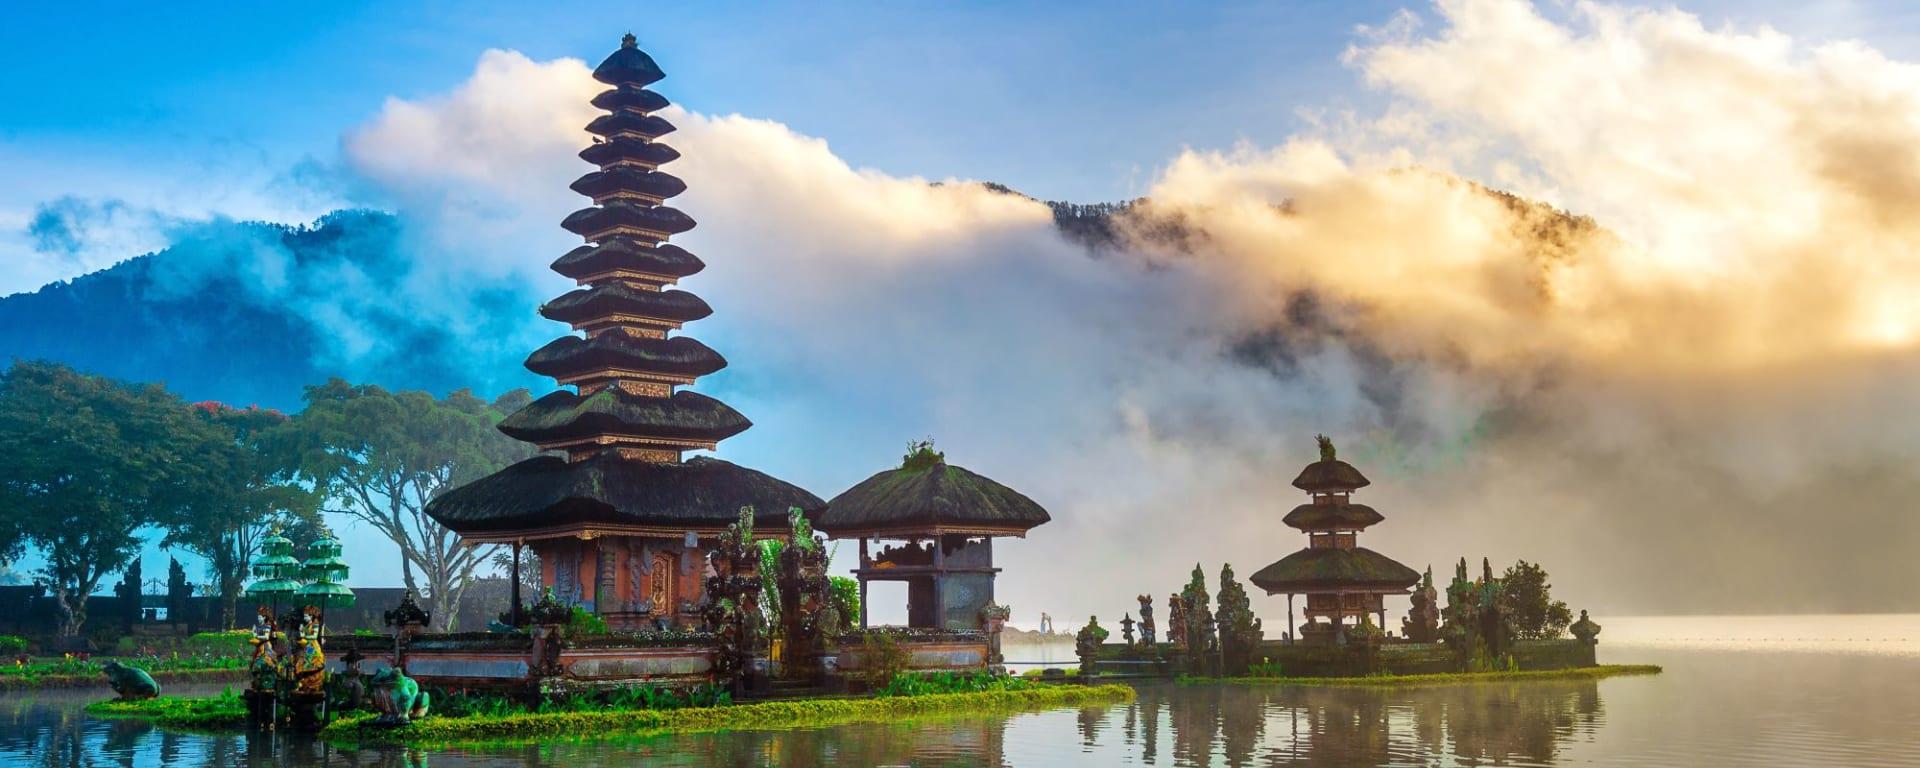 Höhepunkte Balis ab Südbali: Bali Pura Ulun Danu Bratan Temple